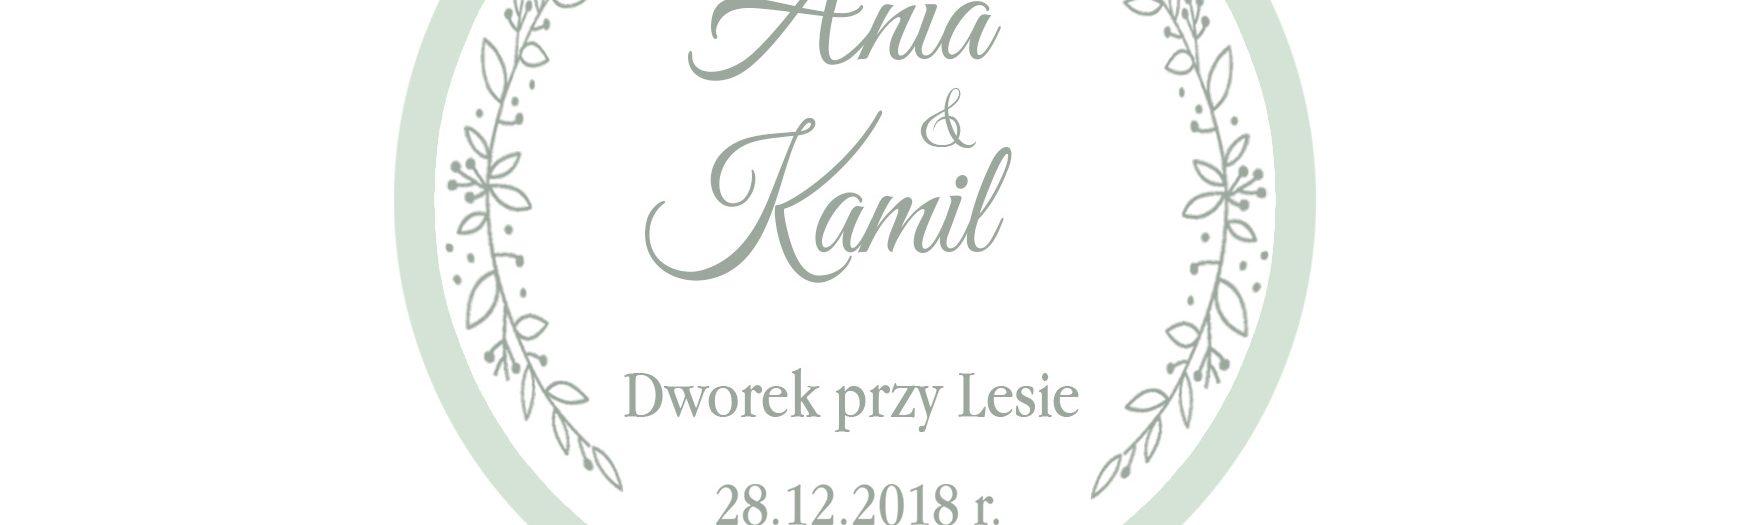 Anna&Kamil wesele - zabawa